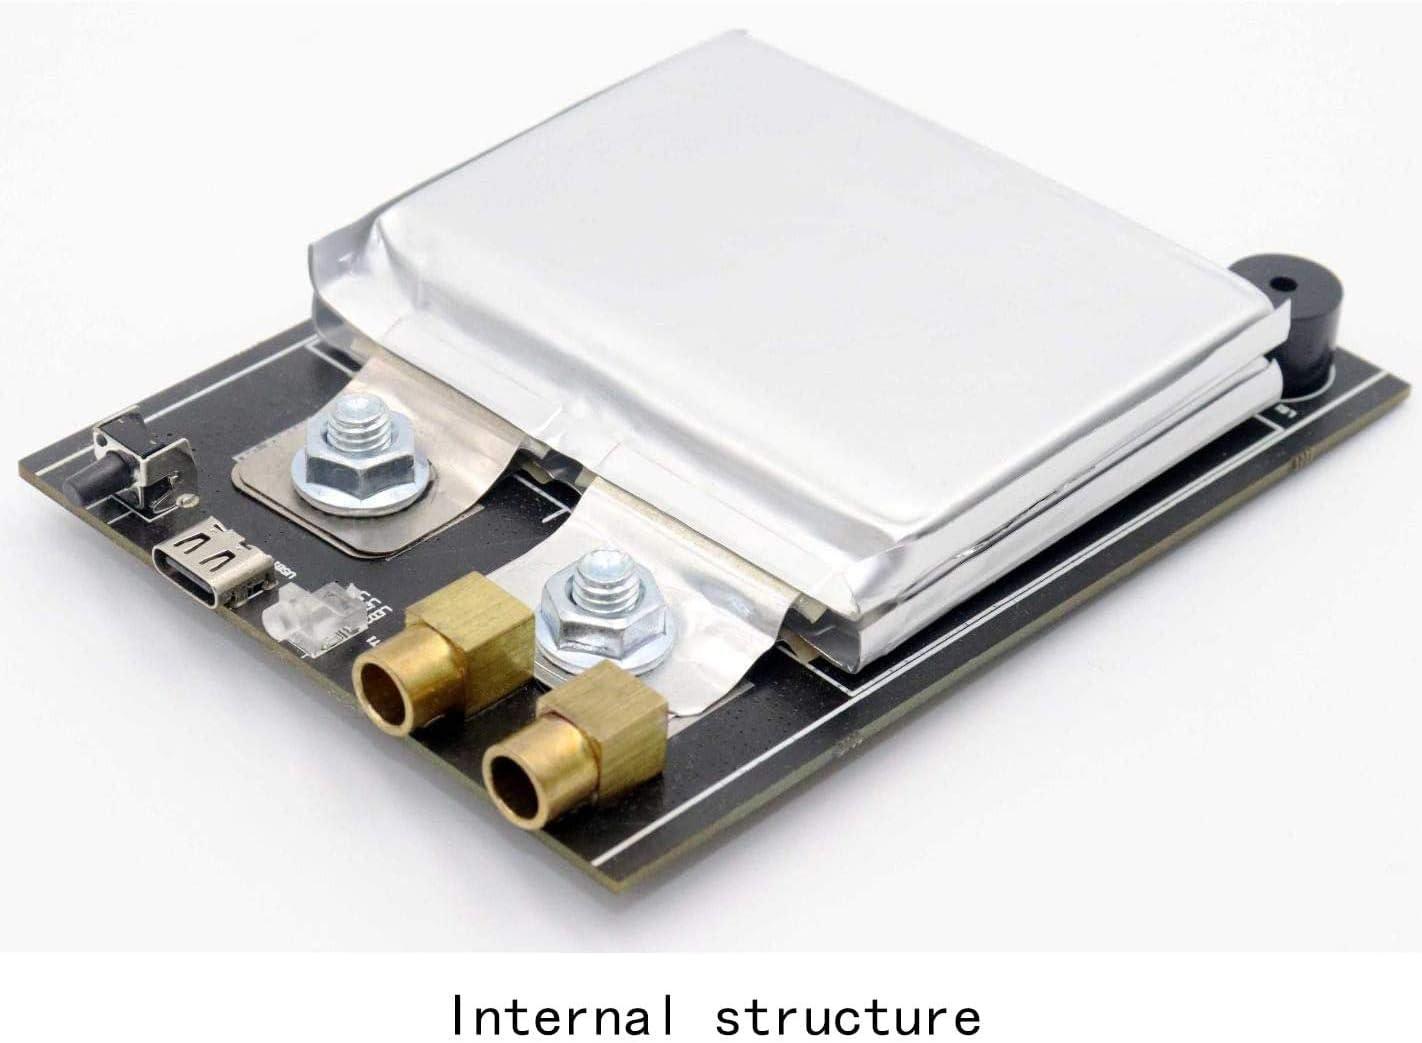 XTD DIY Mini Spot Welder Mit Einem Ladekabel Dritte A Welding Pen 5500 MAh Batterie Punkt-Schwei/ßer-Maschine Mit Nickelblech Punktschwei/ßmaschine Kit 5 G/änge Einstellbar